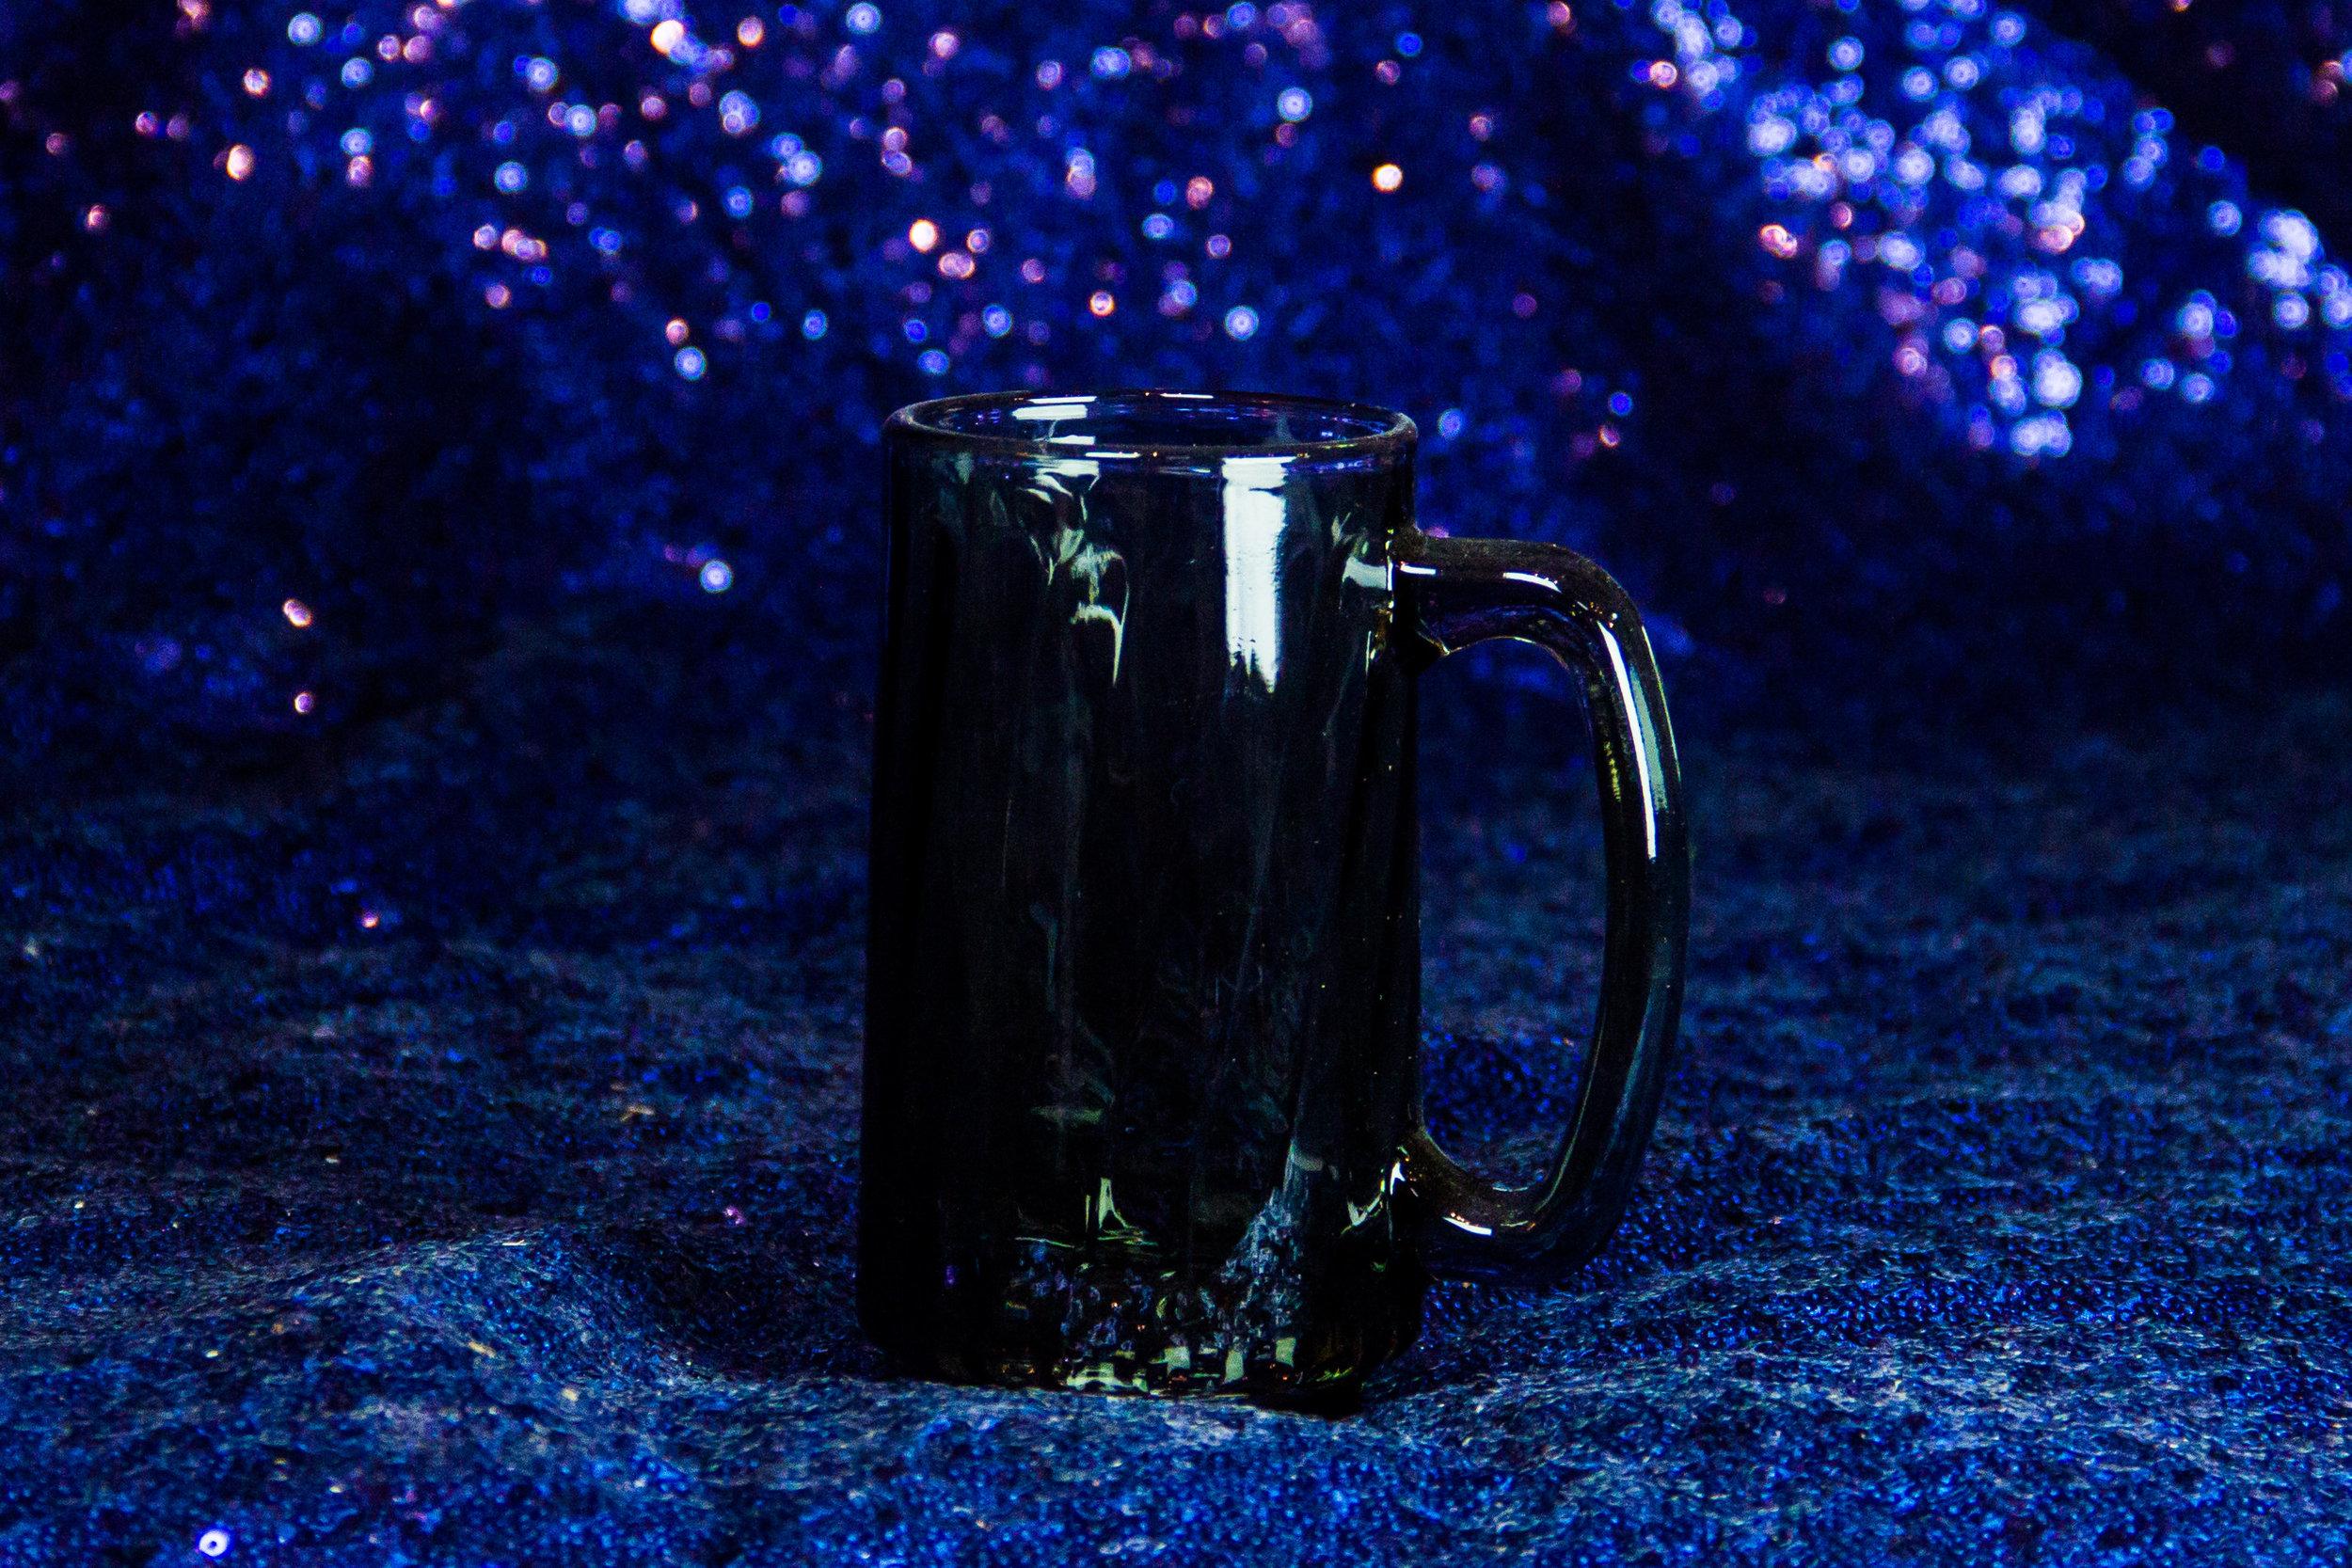 Black Handled Glass